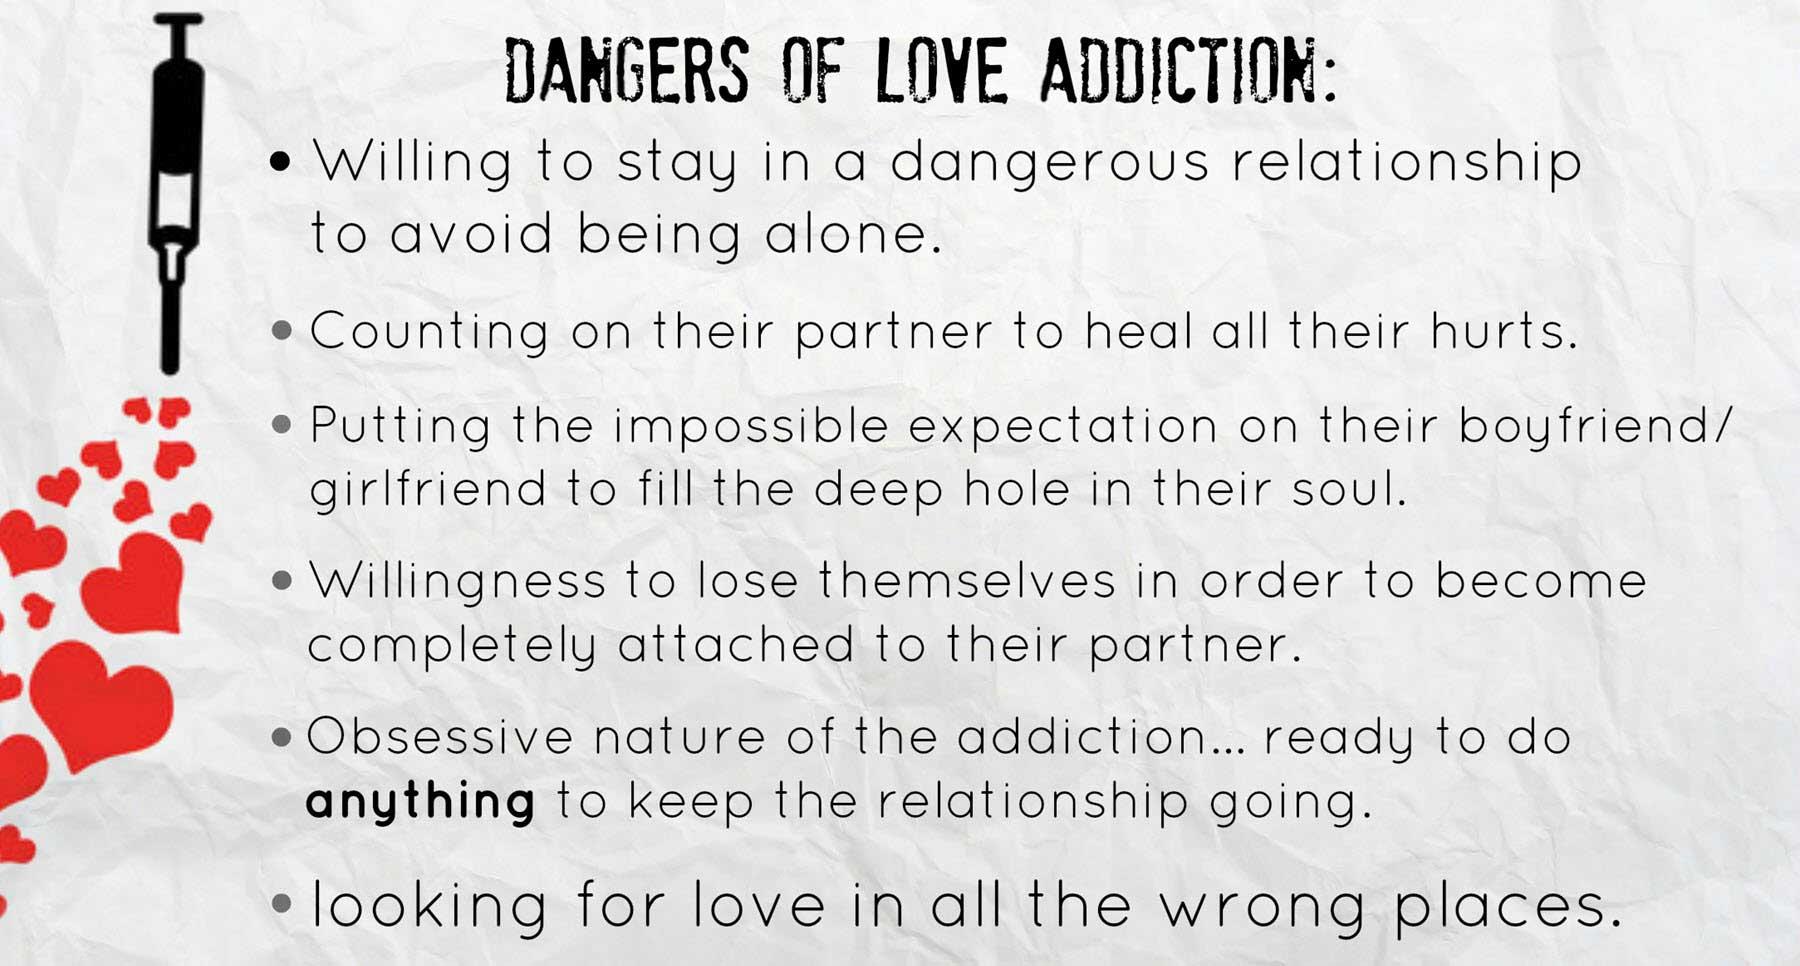 dangers-of-love-addiction